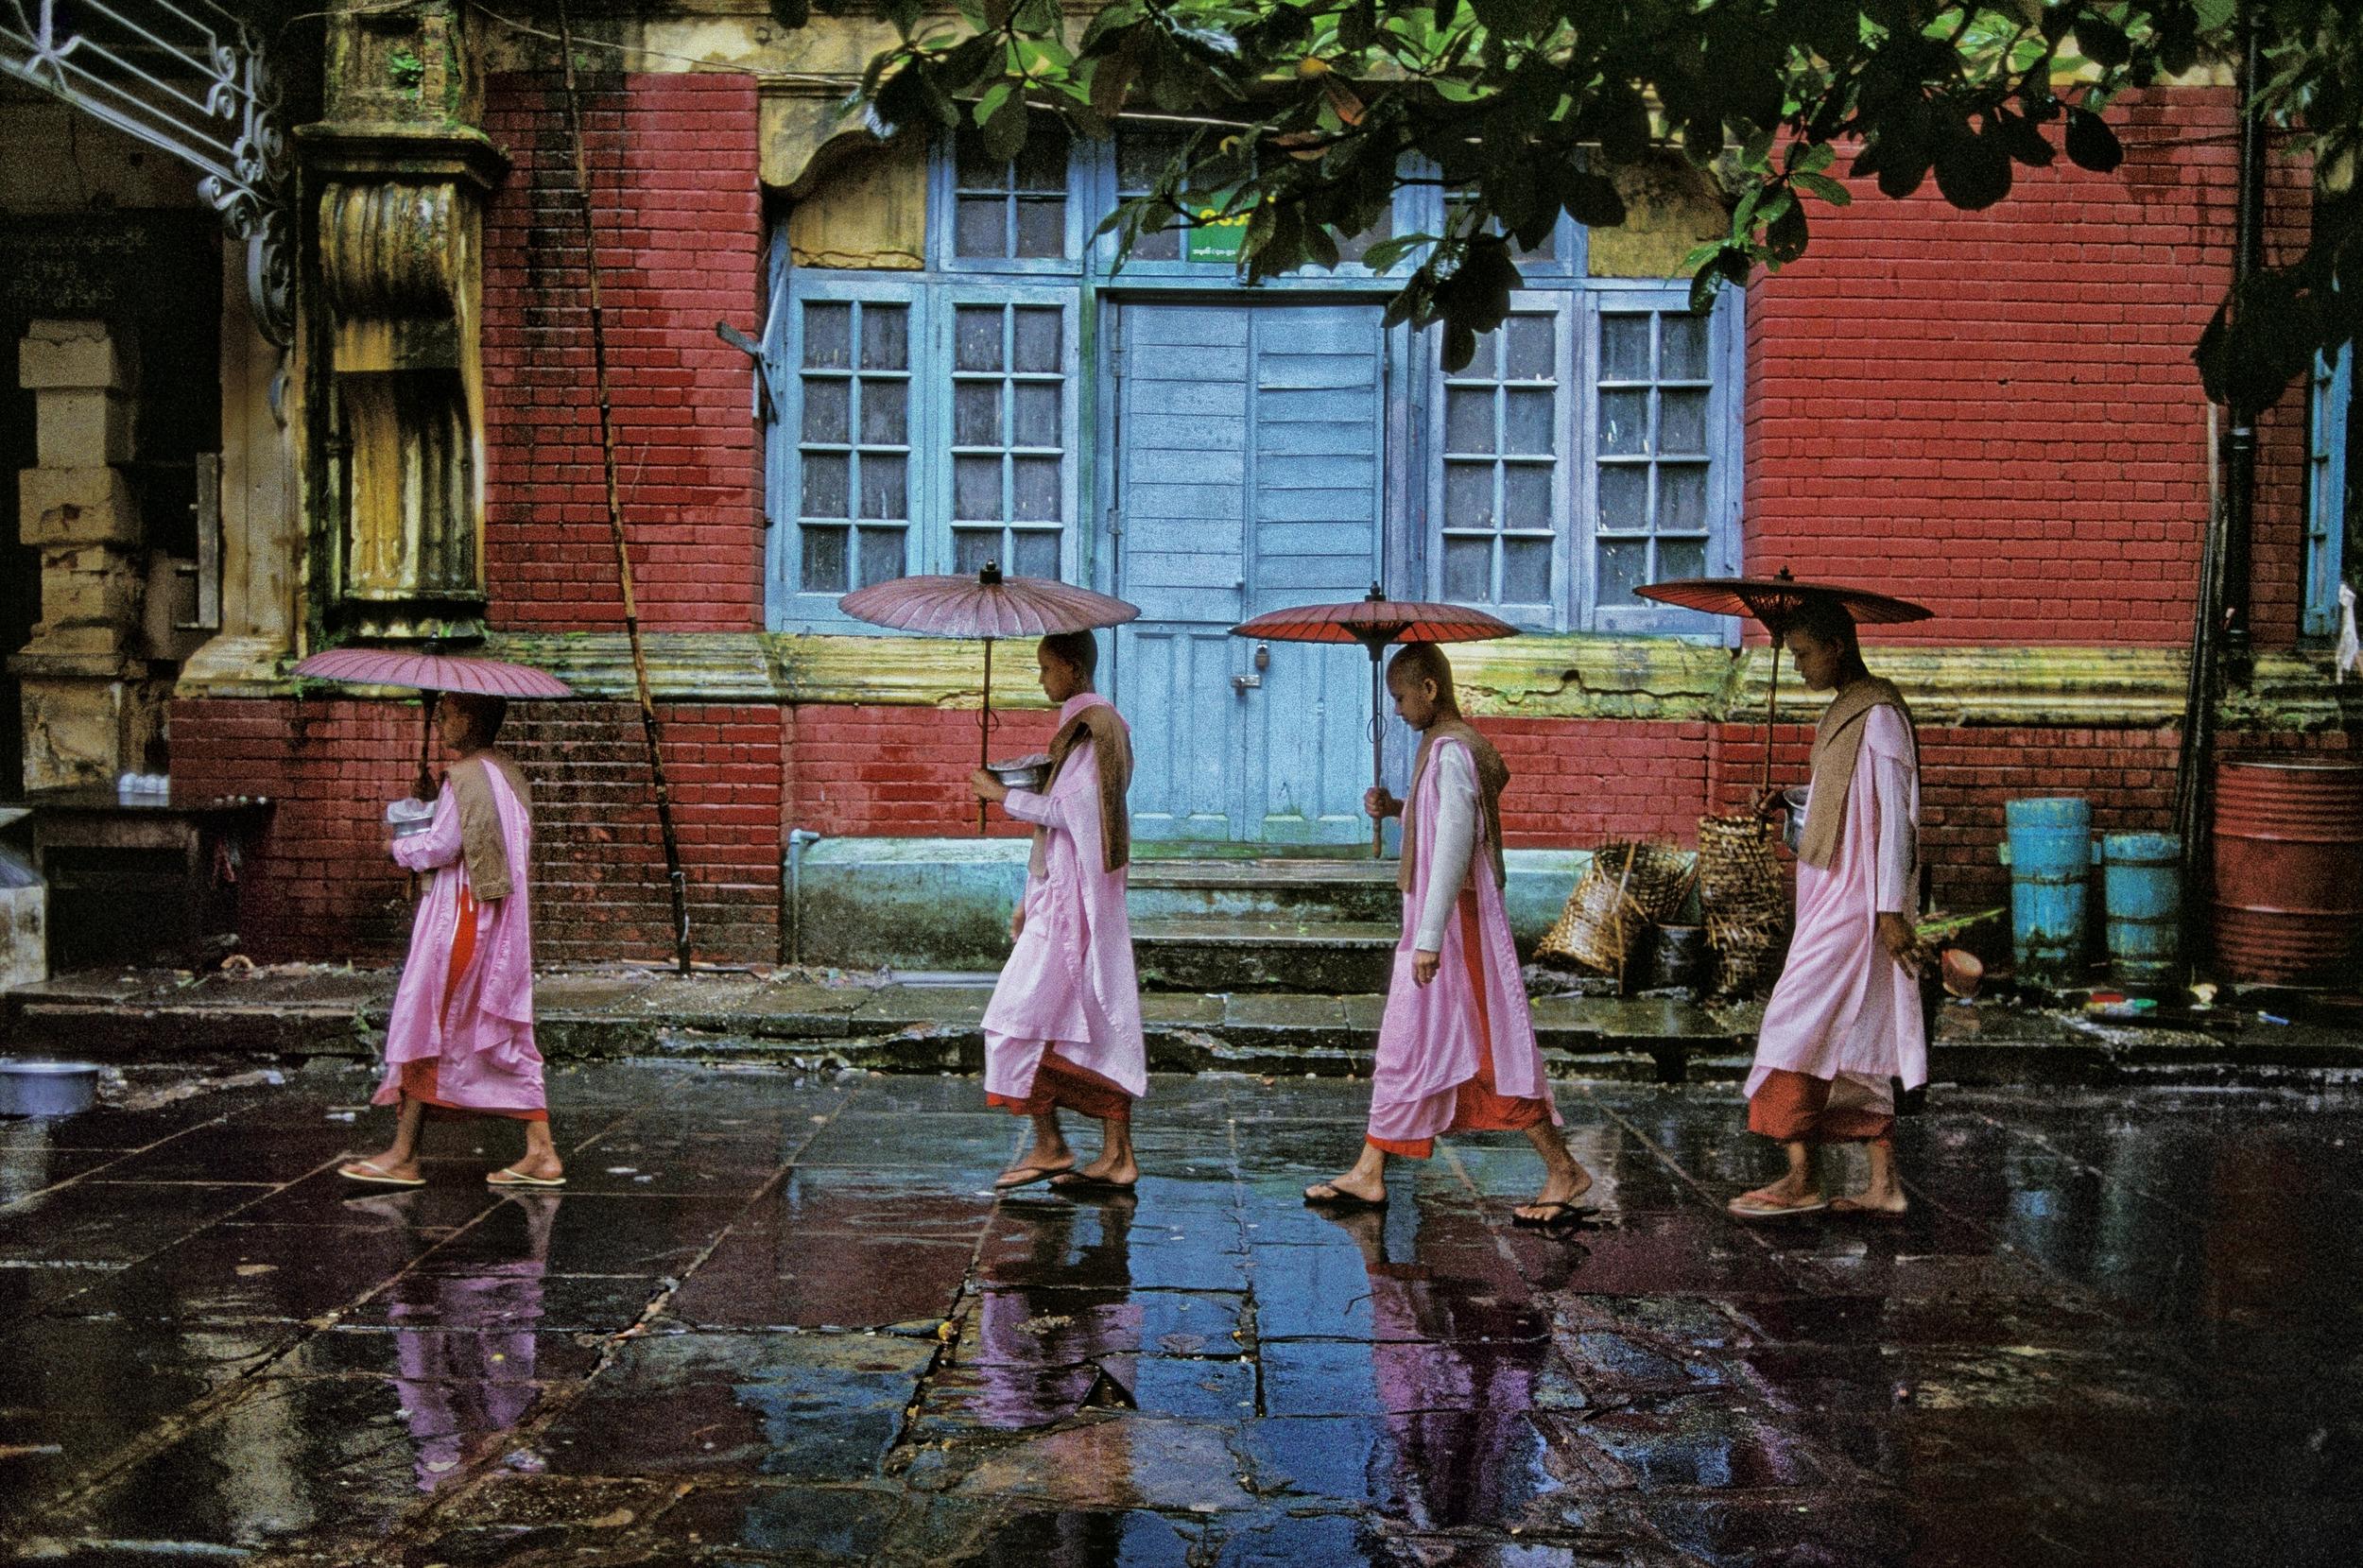 Image above: ©Steve McCurry,Procession of Nuns, Rangoon, 1994, ultrachrome print